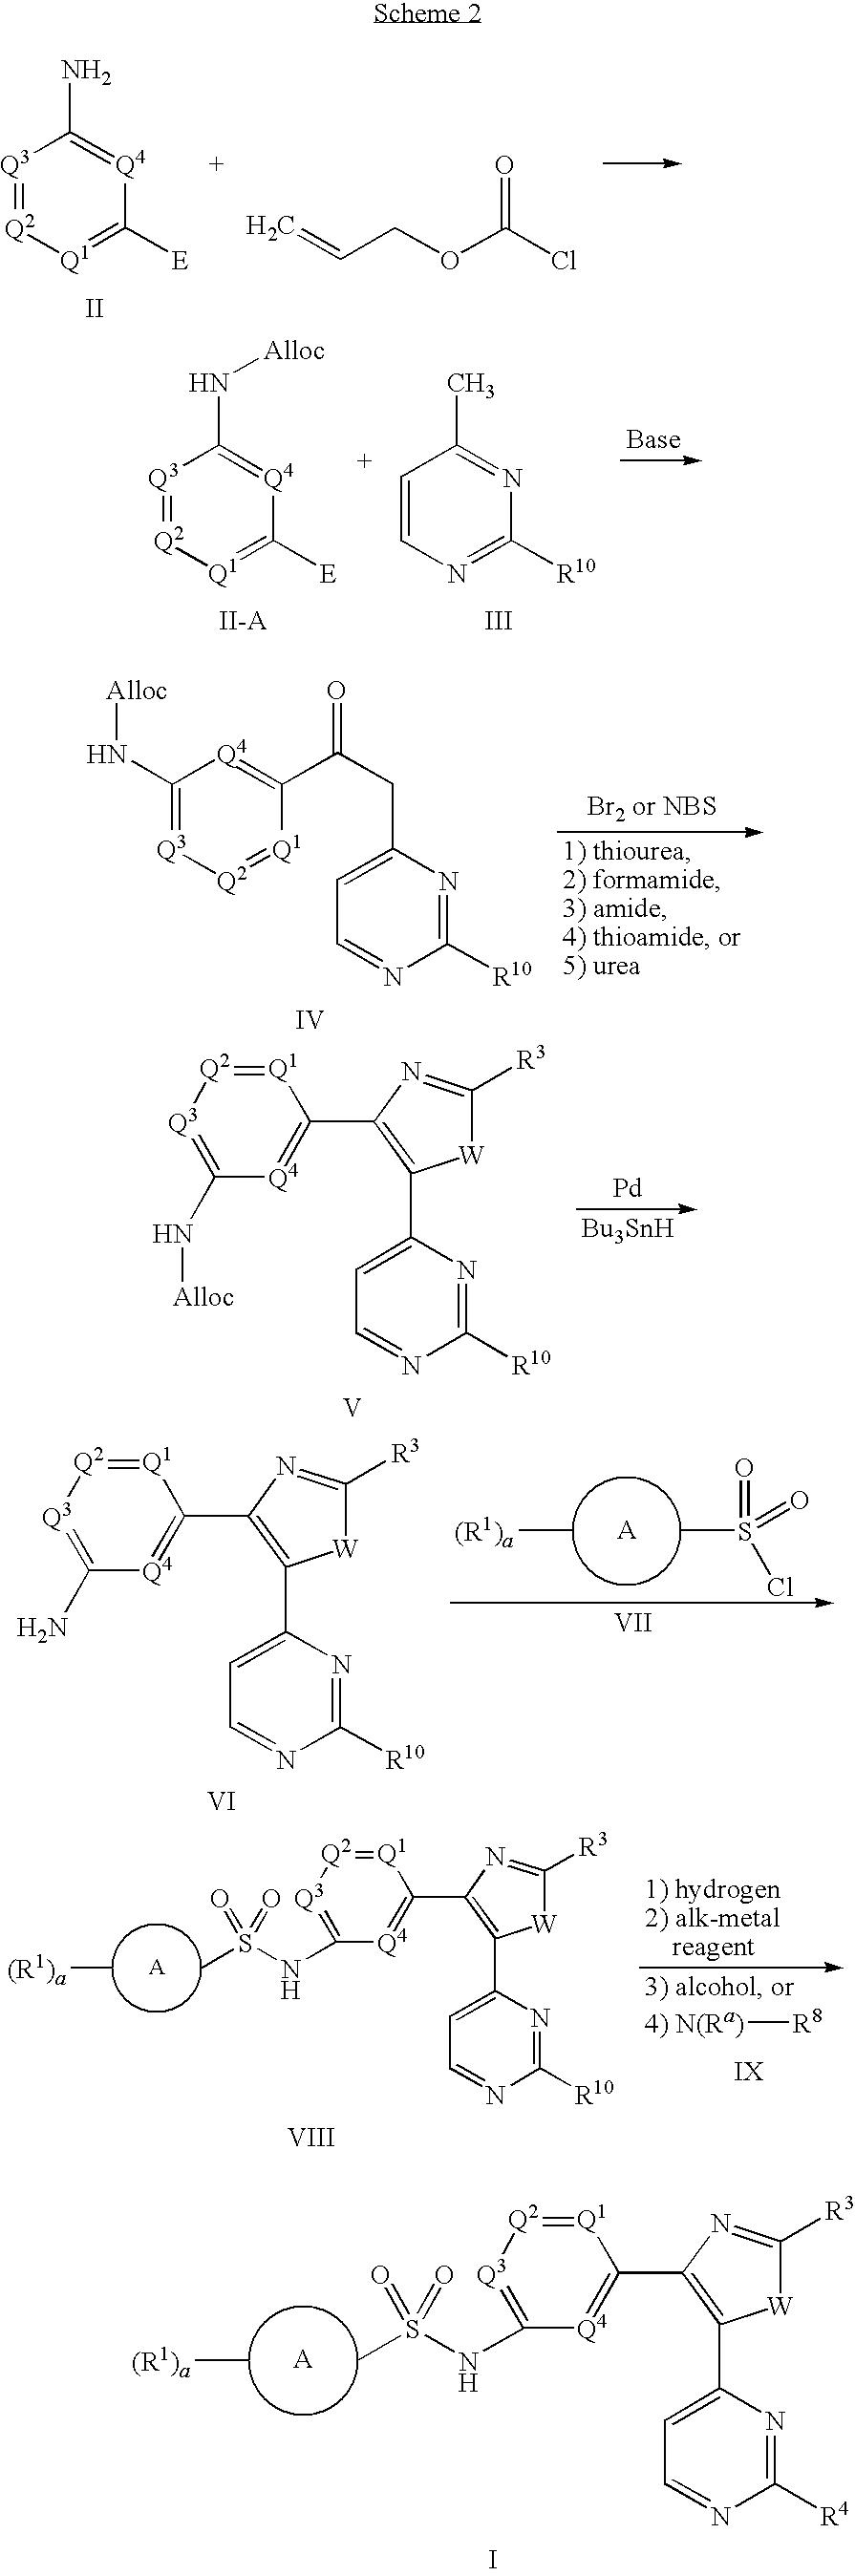 Us20090298815a1 Benzene Sulfonamide Thiazole And Oxazole Compounds Bolens G174 Wiring Diagram Figure 20091203 C00076